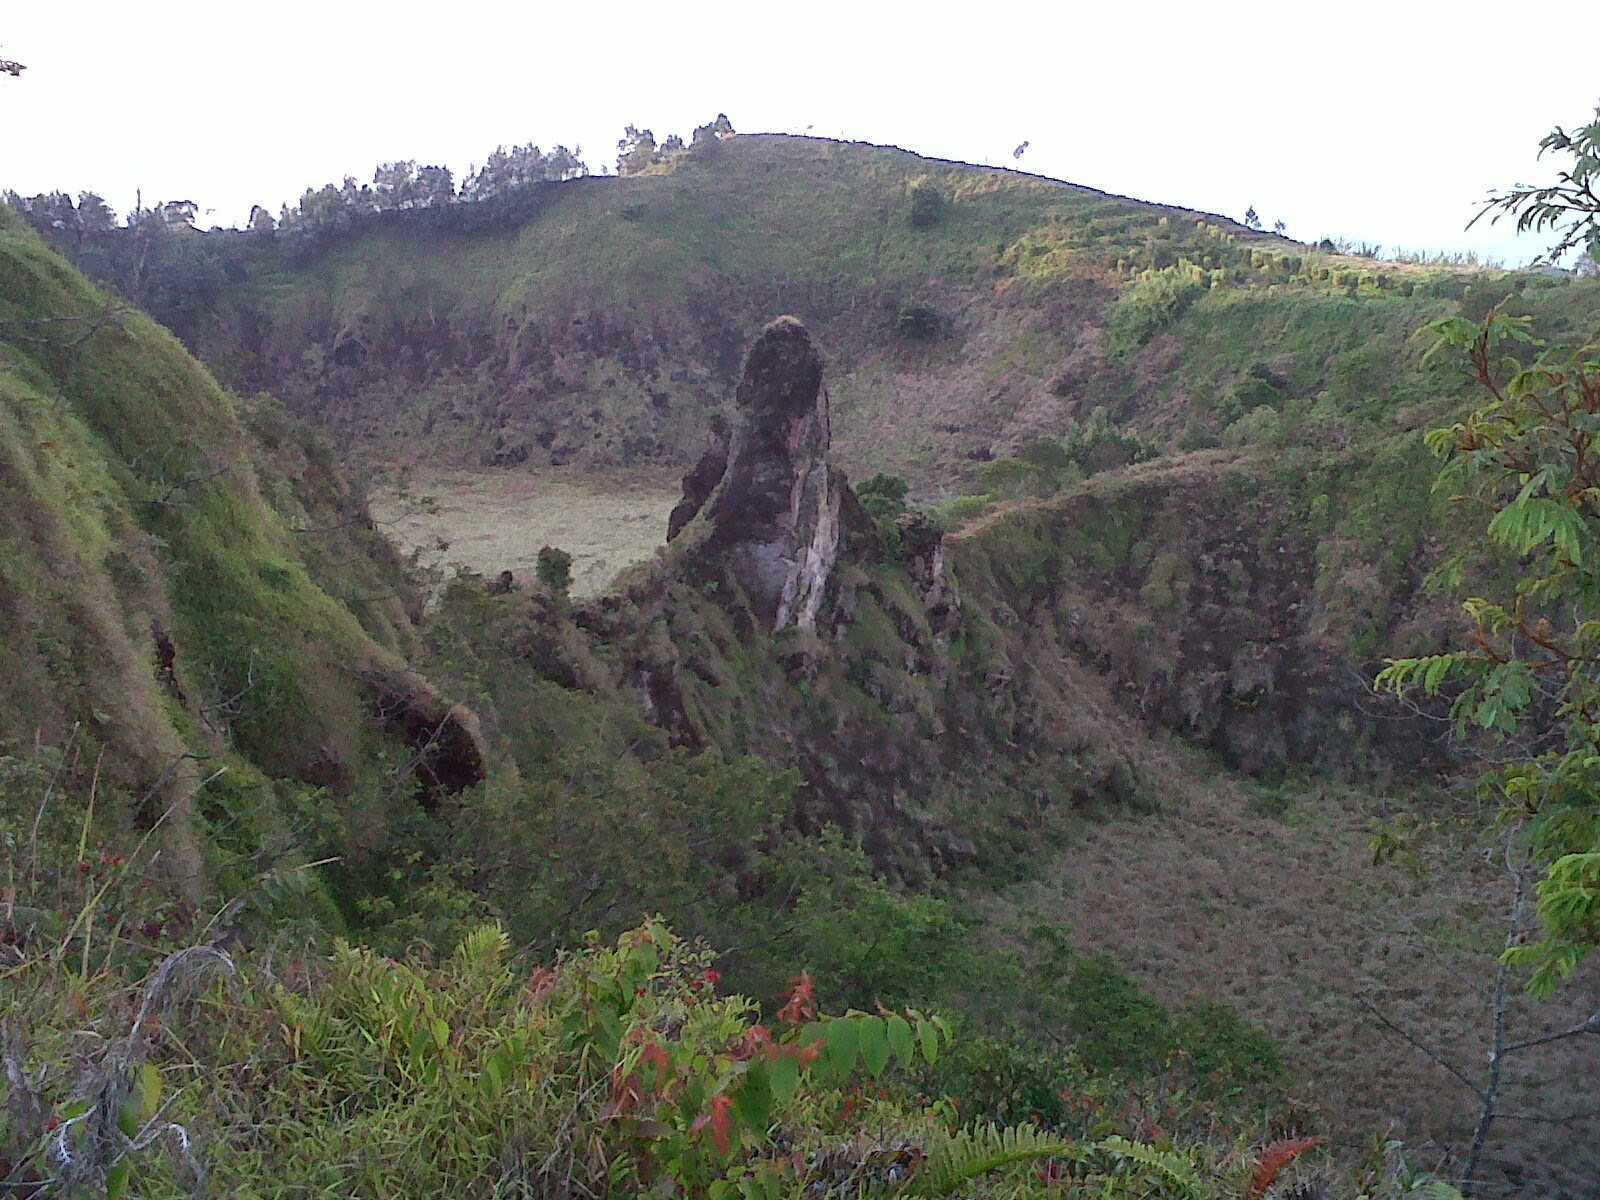 http://cityhyangdiengtour.blogspot.com/2014/09/pendakian-gunung-pakuwojo.html